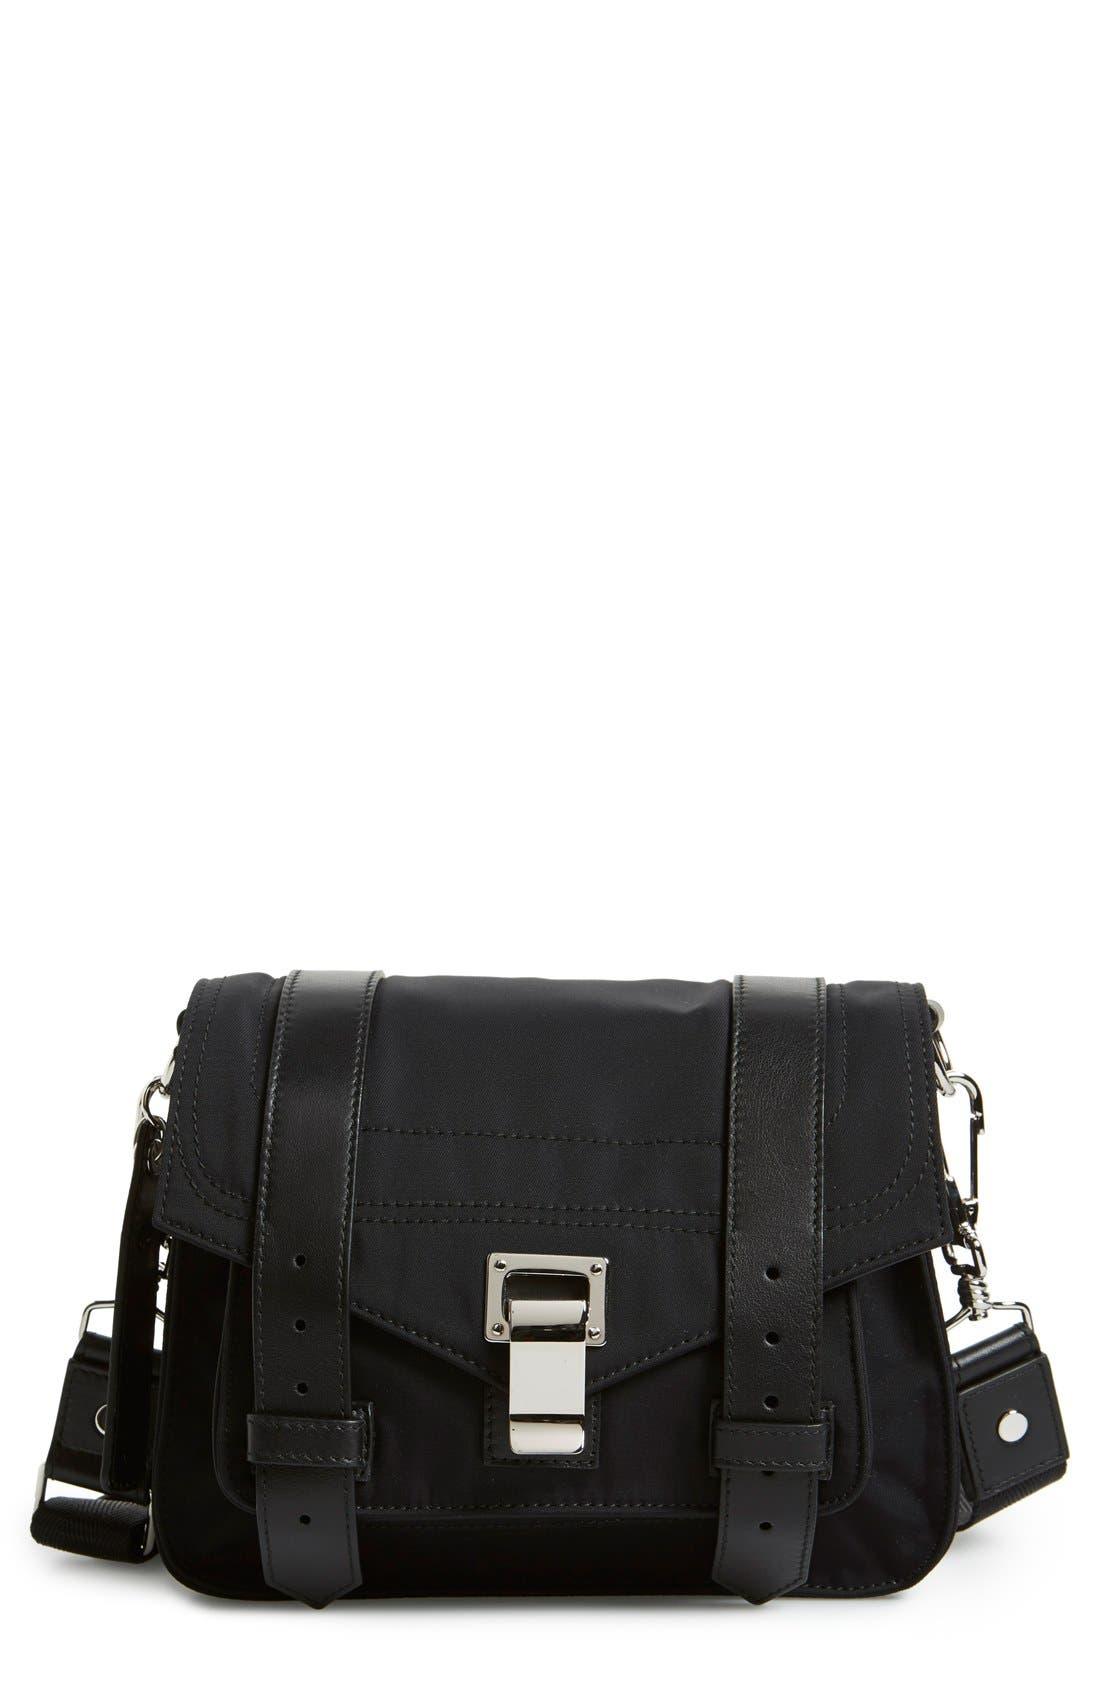 'PS1 Pouch' Nylon Crossbody Bag, Main, color, 001